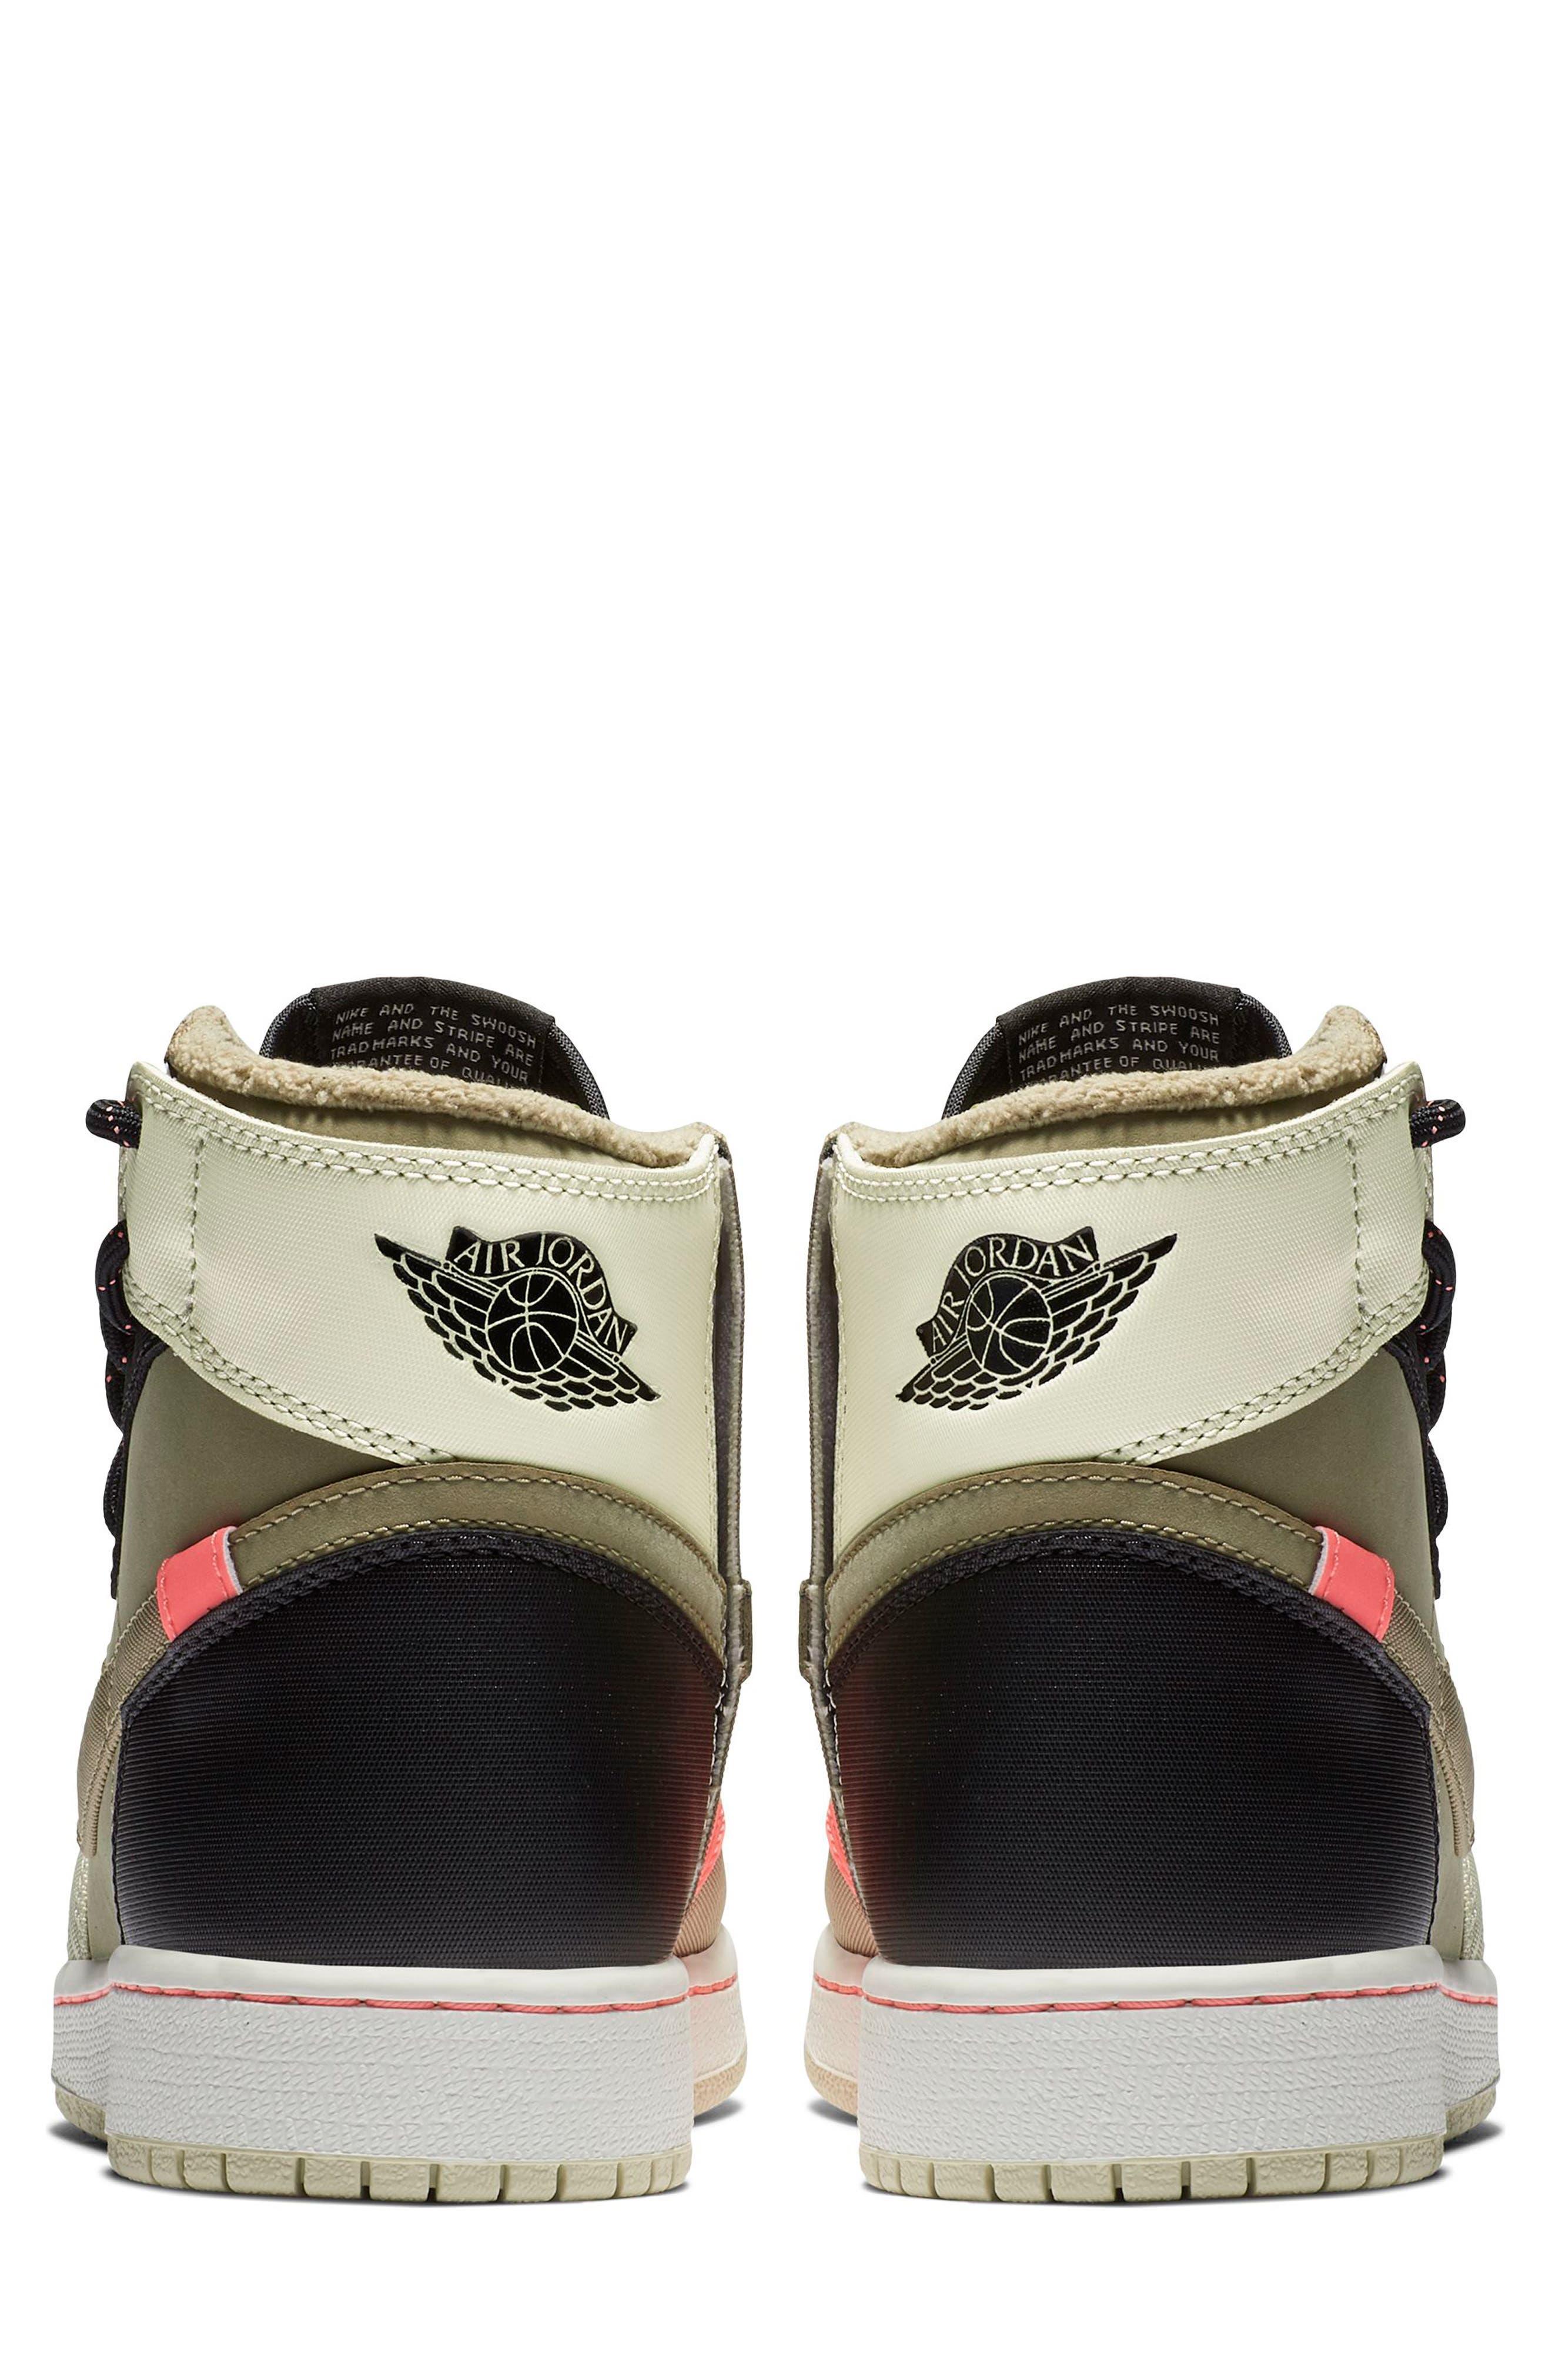 Air Jordan 1 Rebel XX Utility High Top Sneaker,                             Alternate thumbnail 2, color,                             PARACHUTE BEIGE